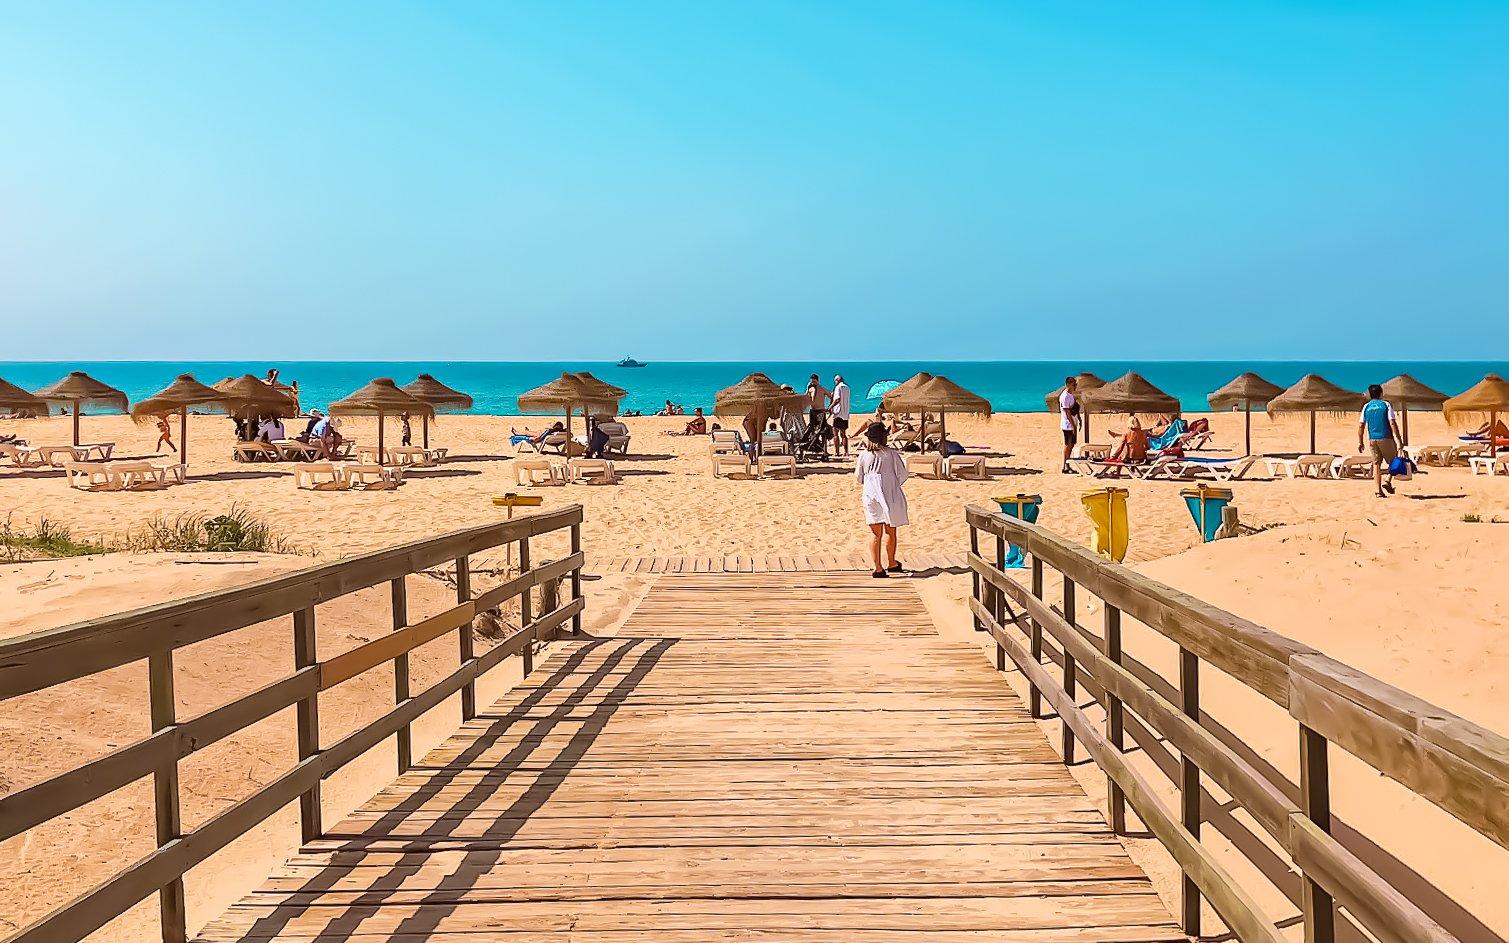 Boardwalk and umbrellas at Praia da Rocha Baixinha